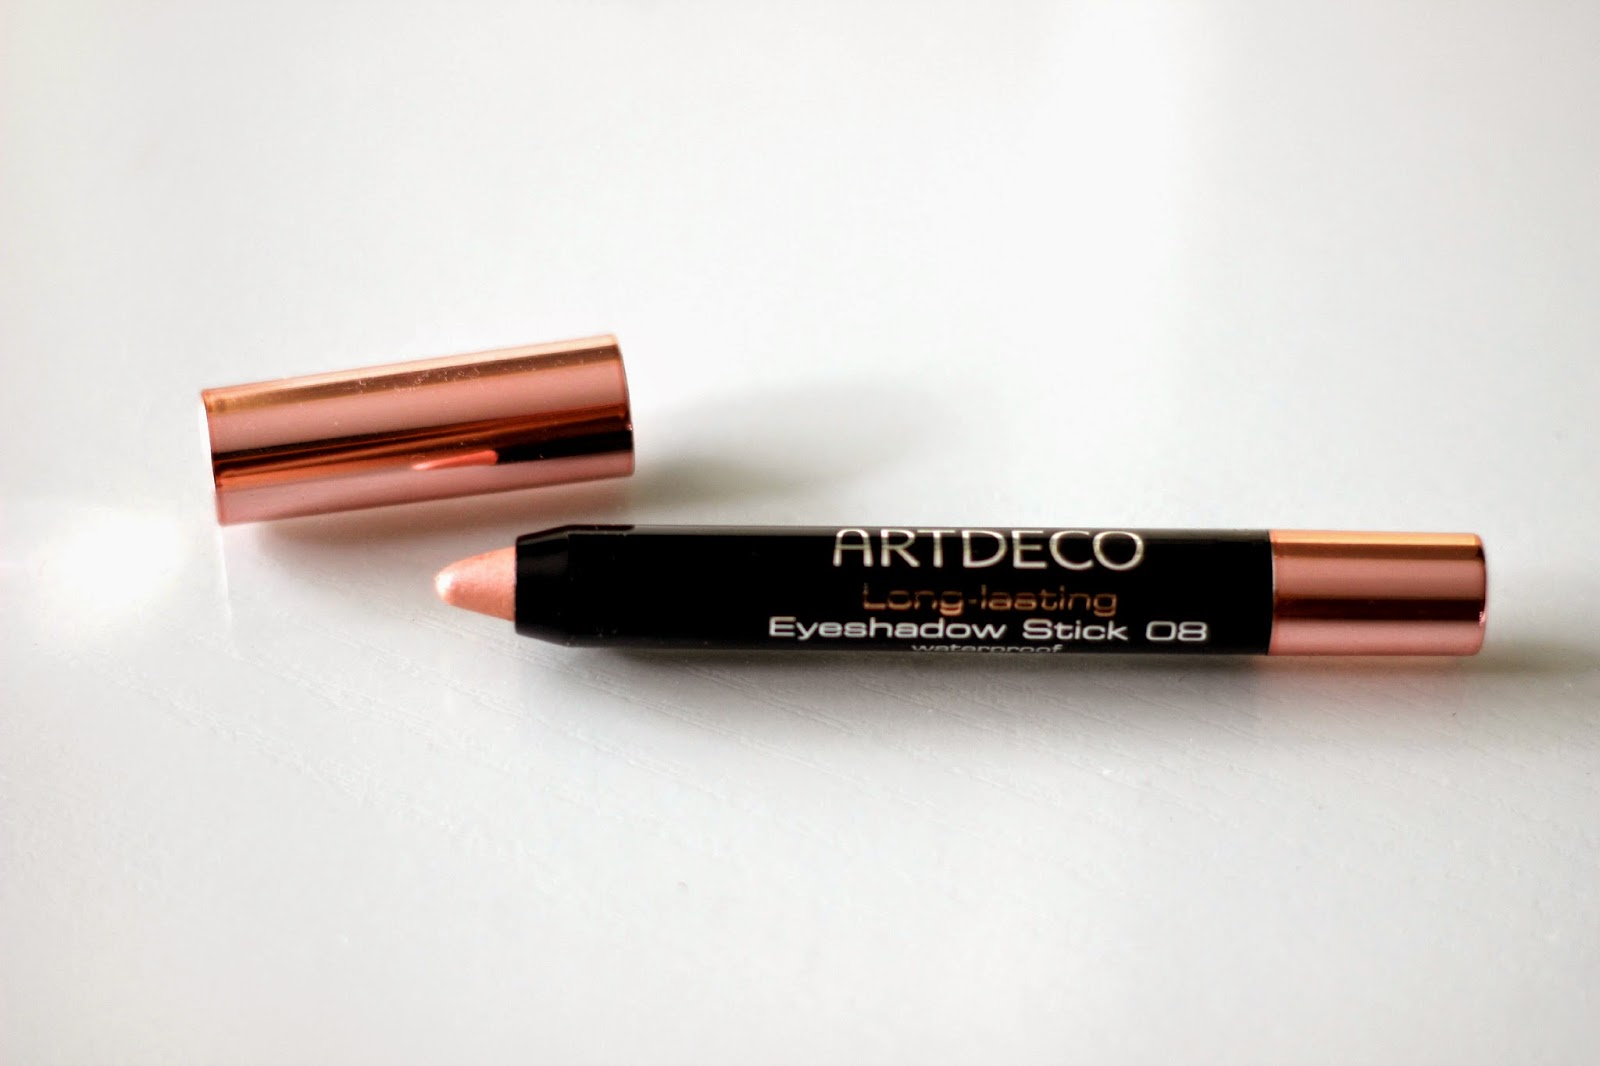 Artdeco Miami Summer 2014 Makeup Collection picture